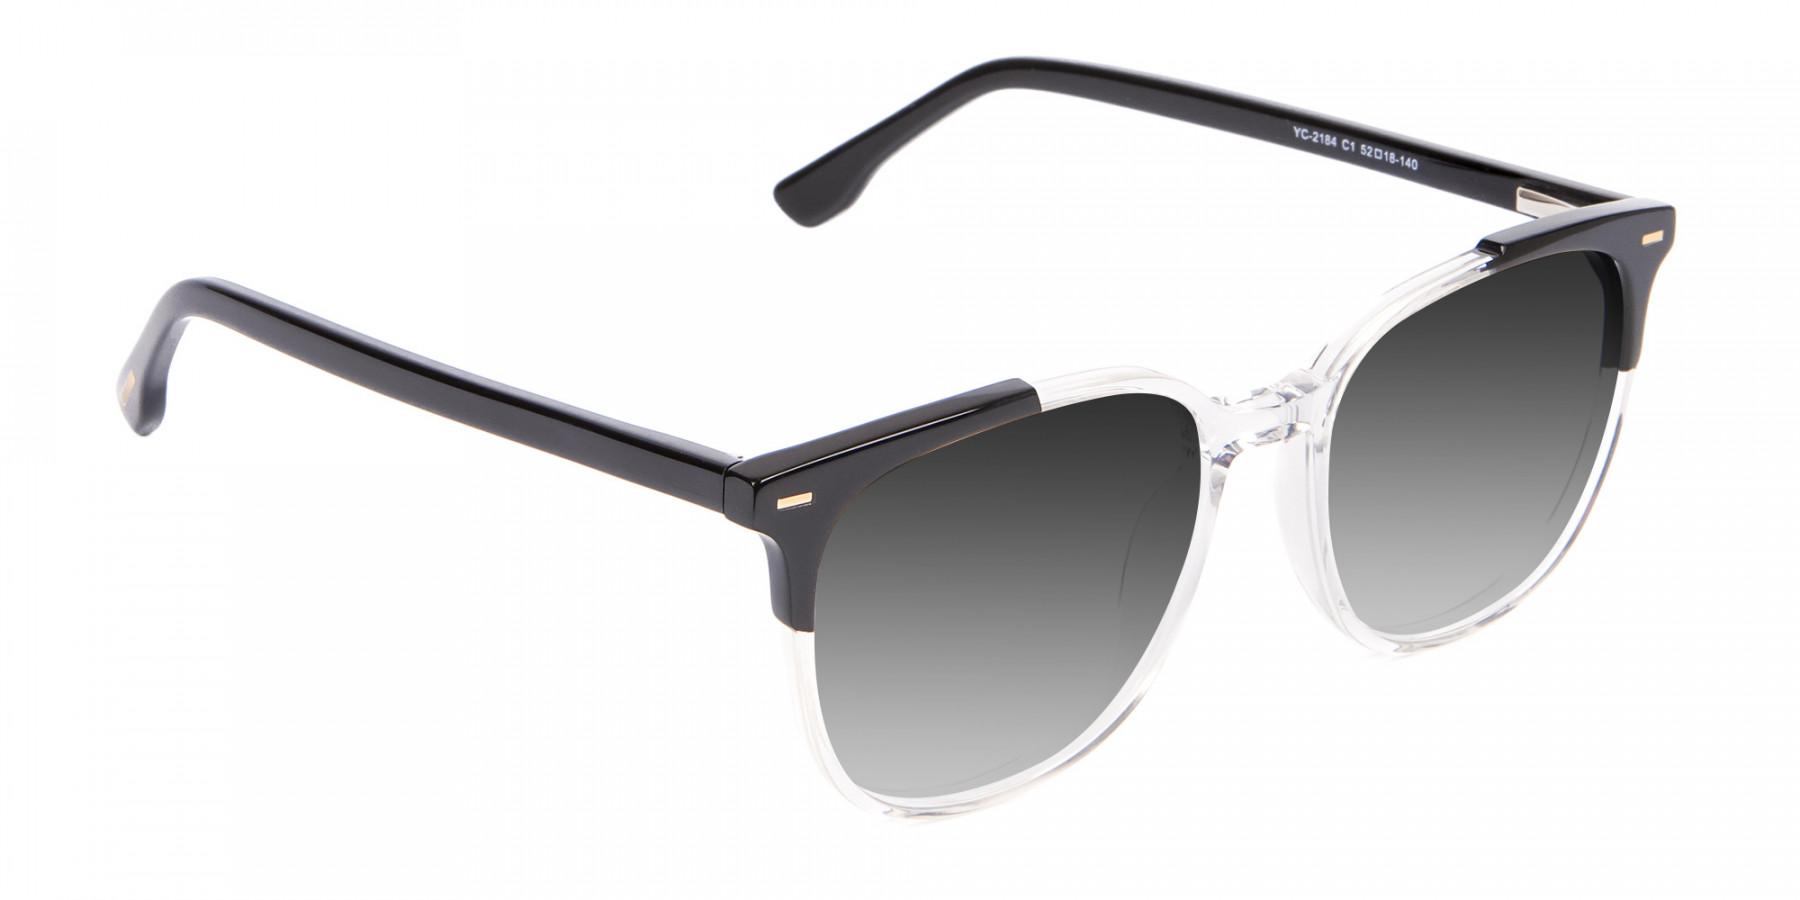 Crystal Retro Wayfarer Sunglasses Online UK-3